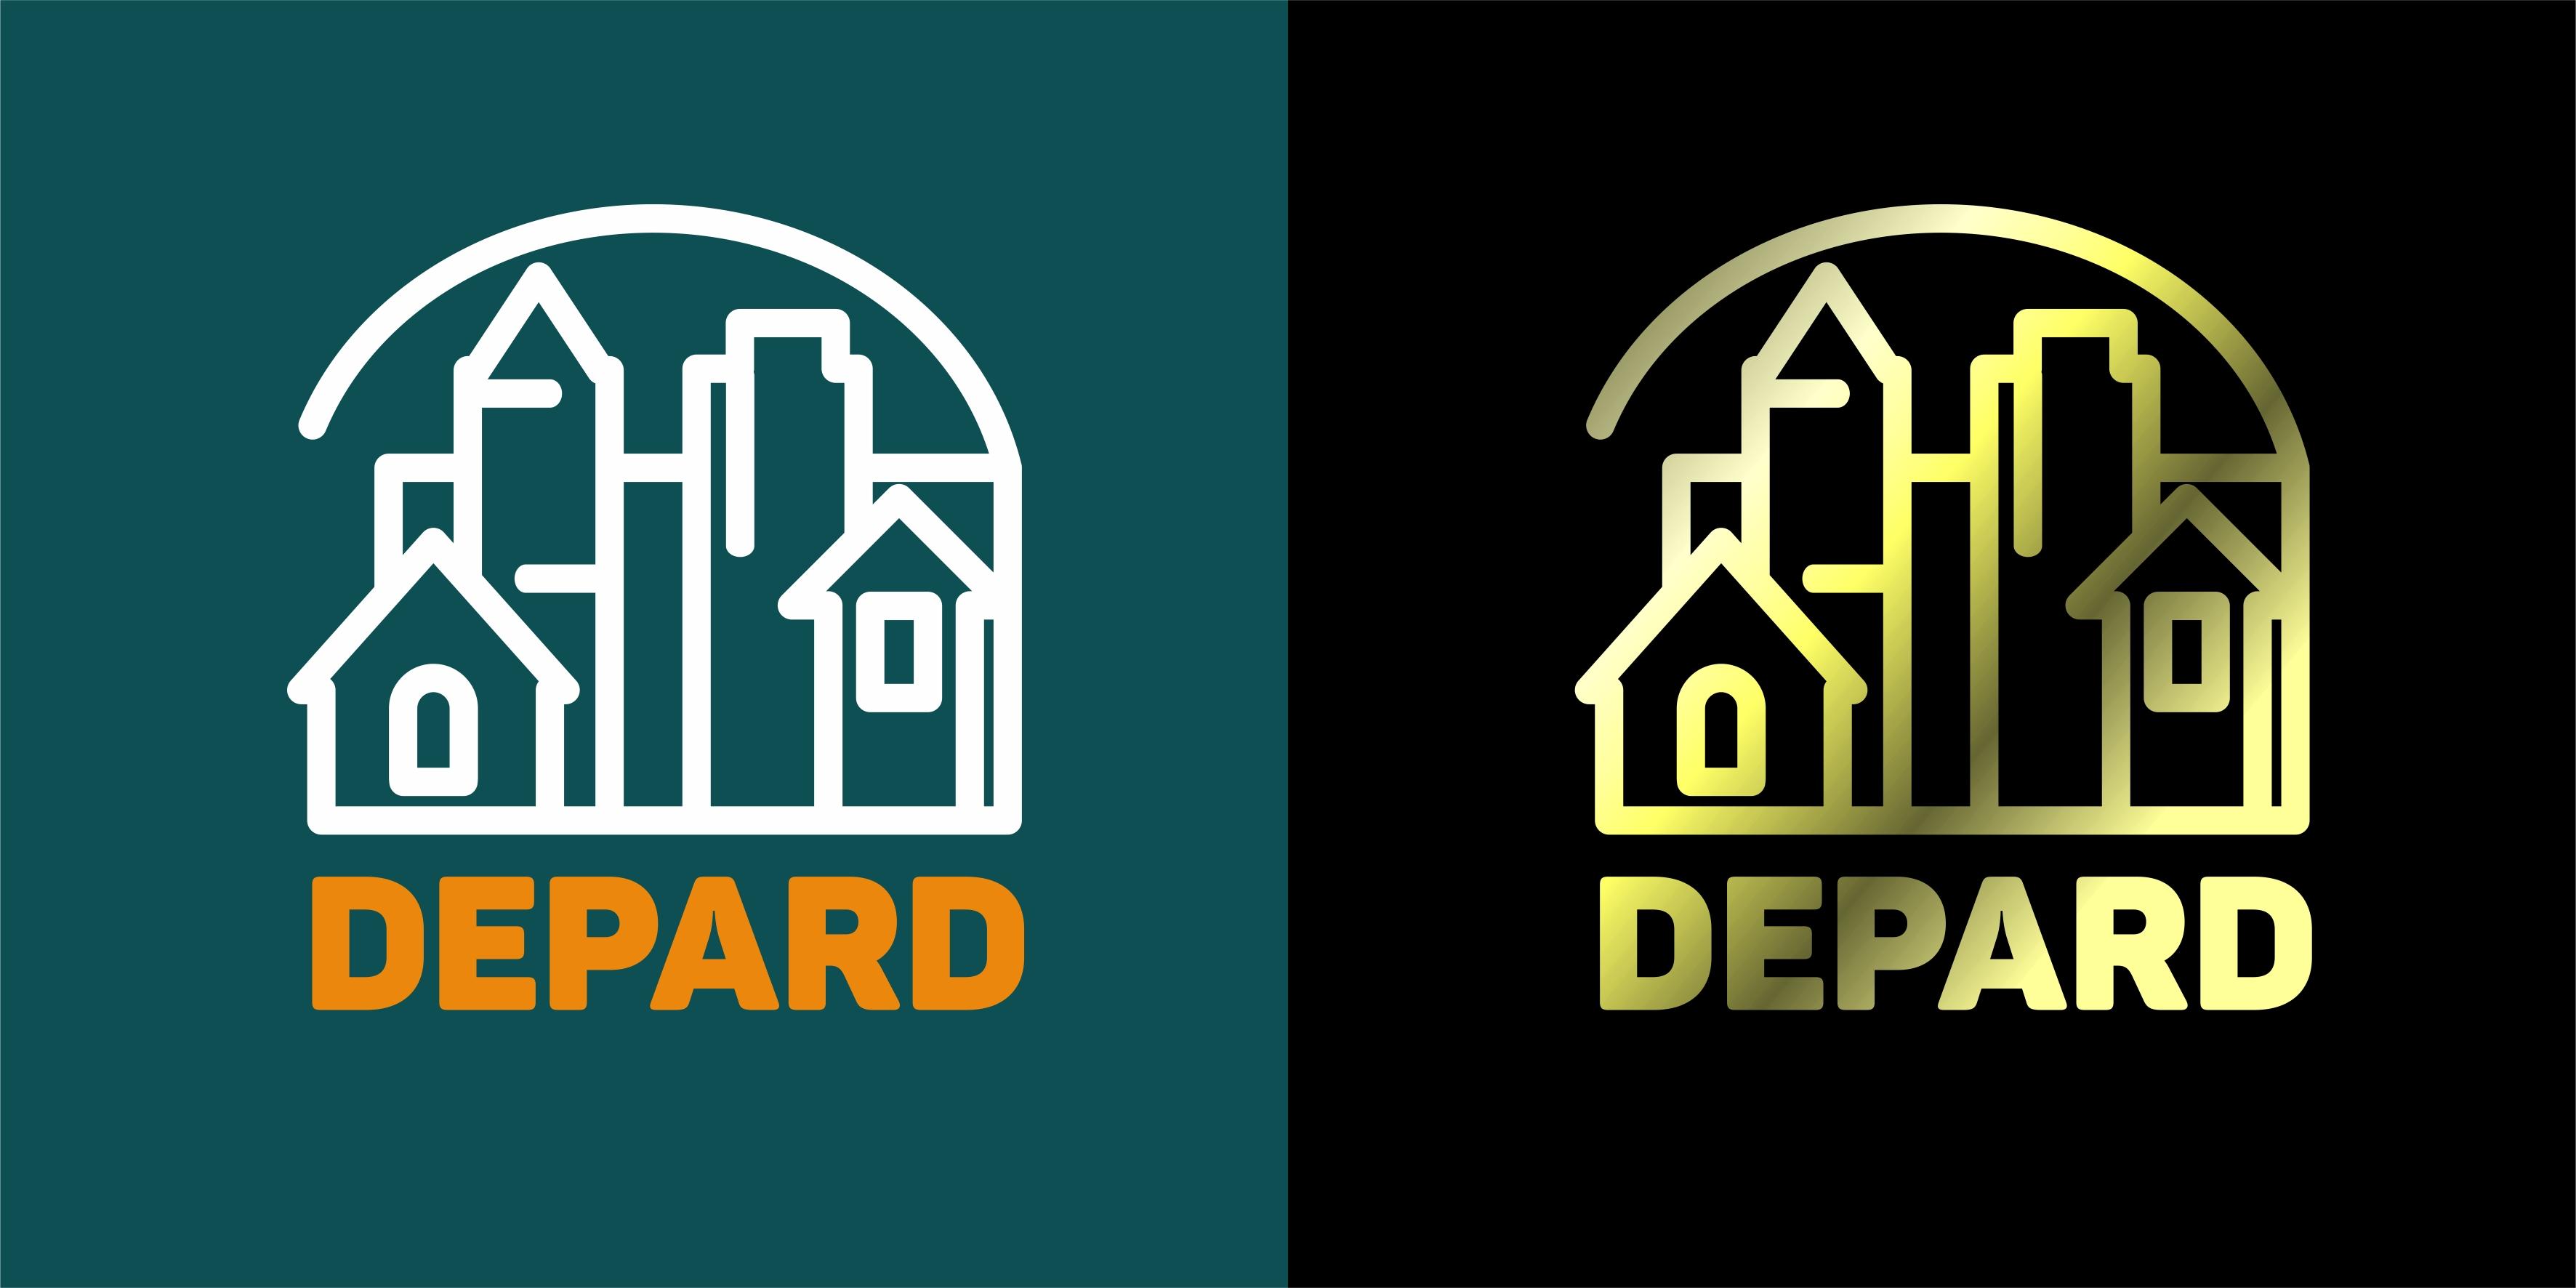 Логотип для компании (услуги недвижимость) фото f_576593530e3a7d67.jpg